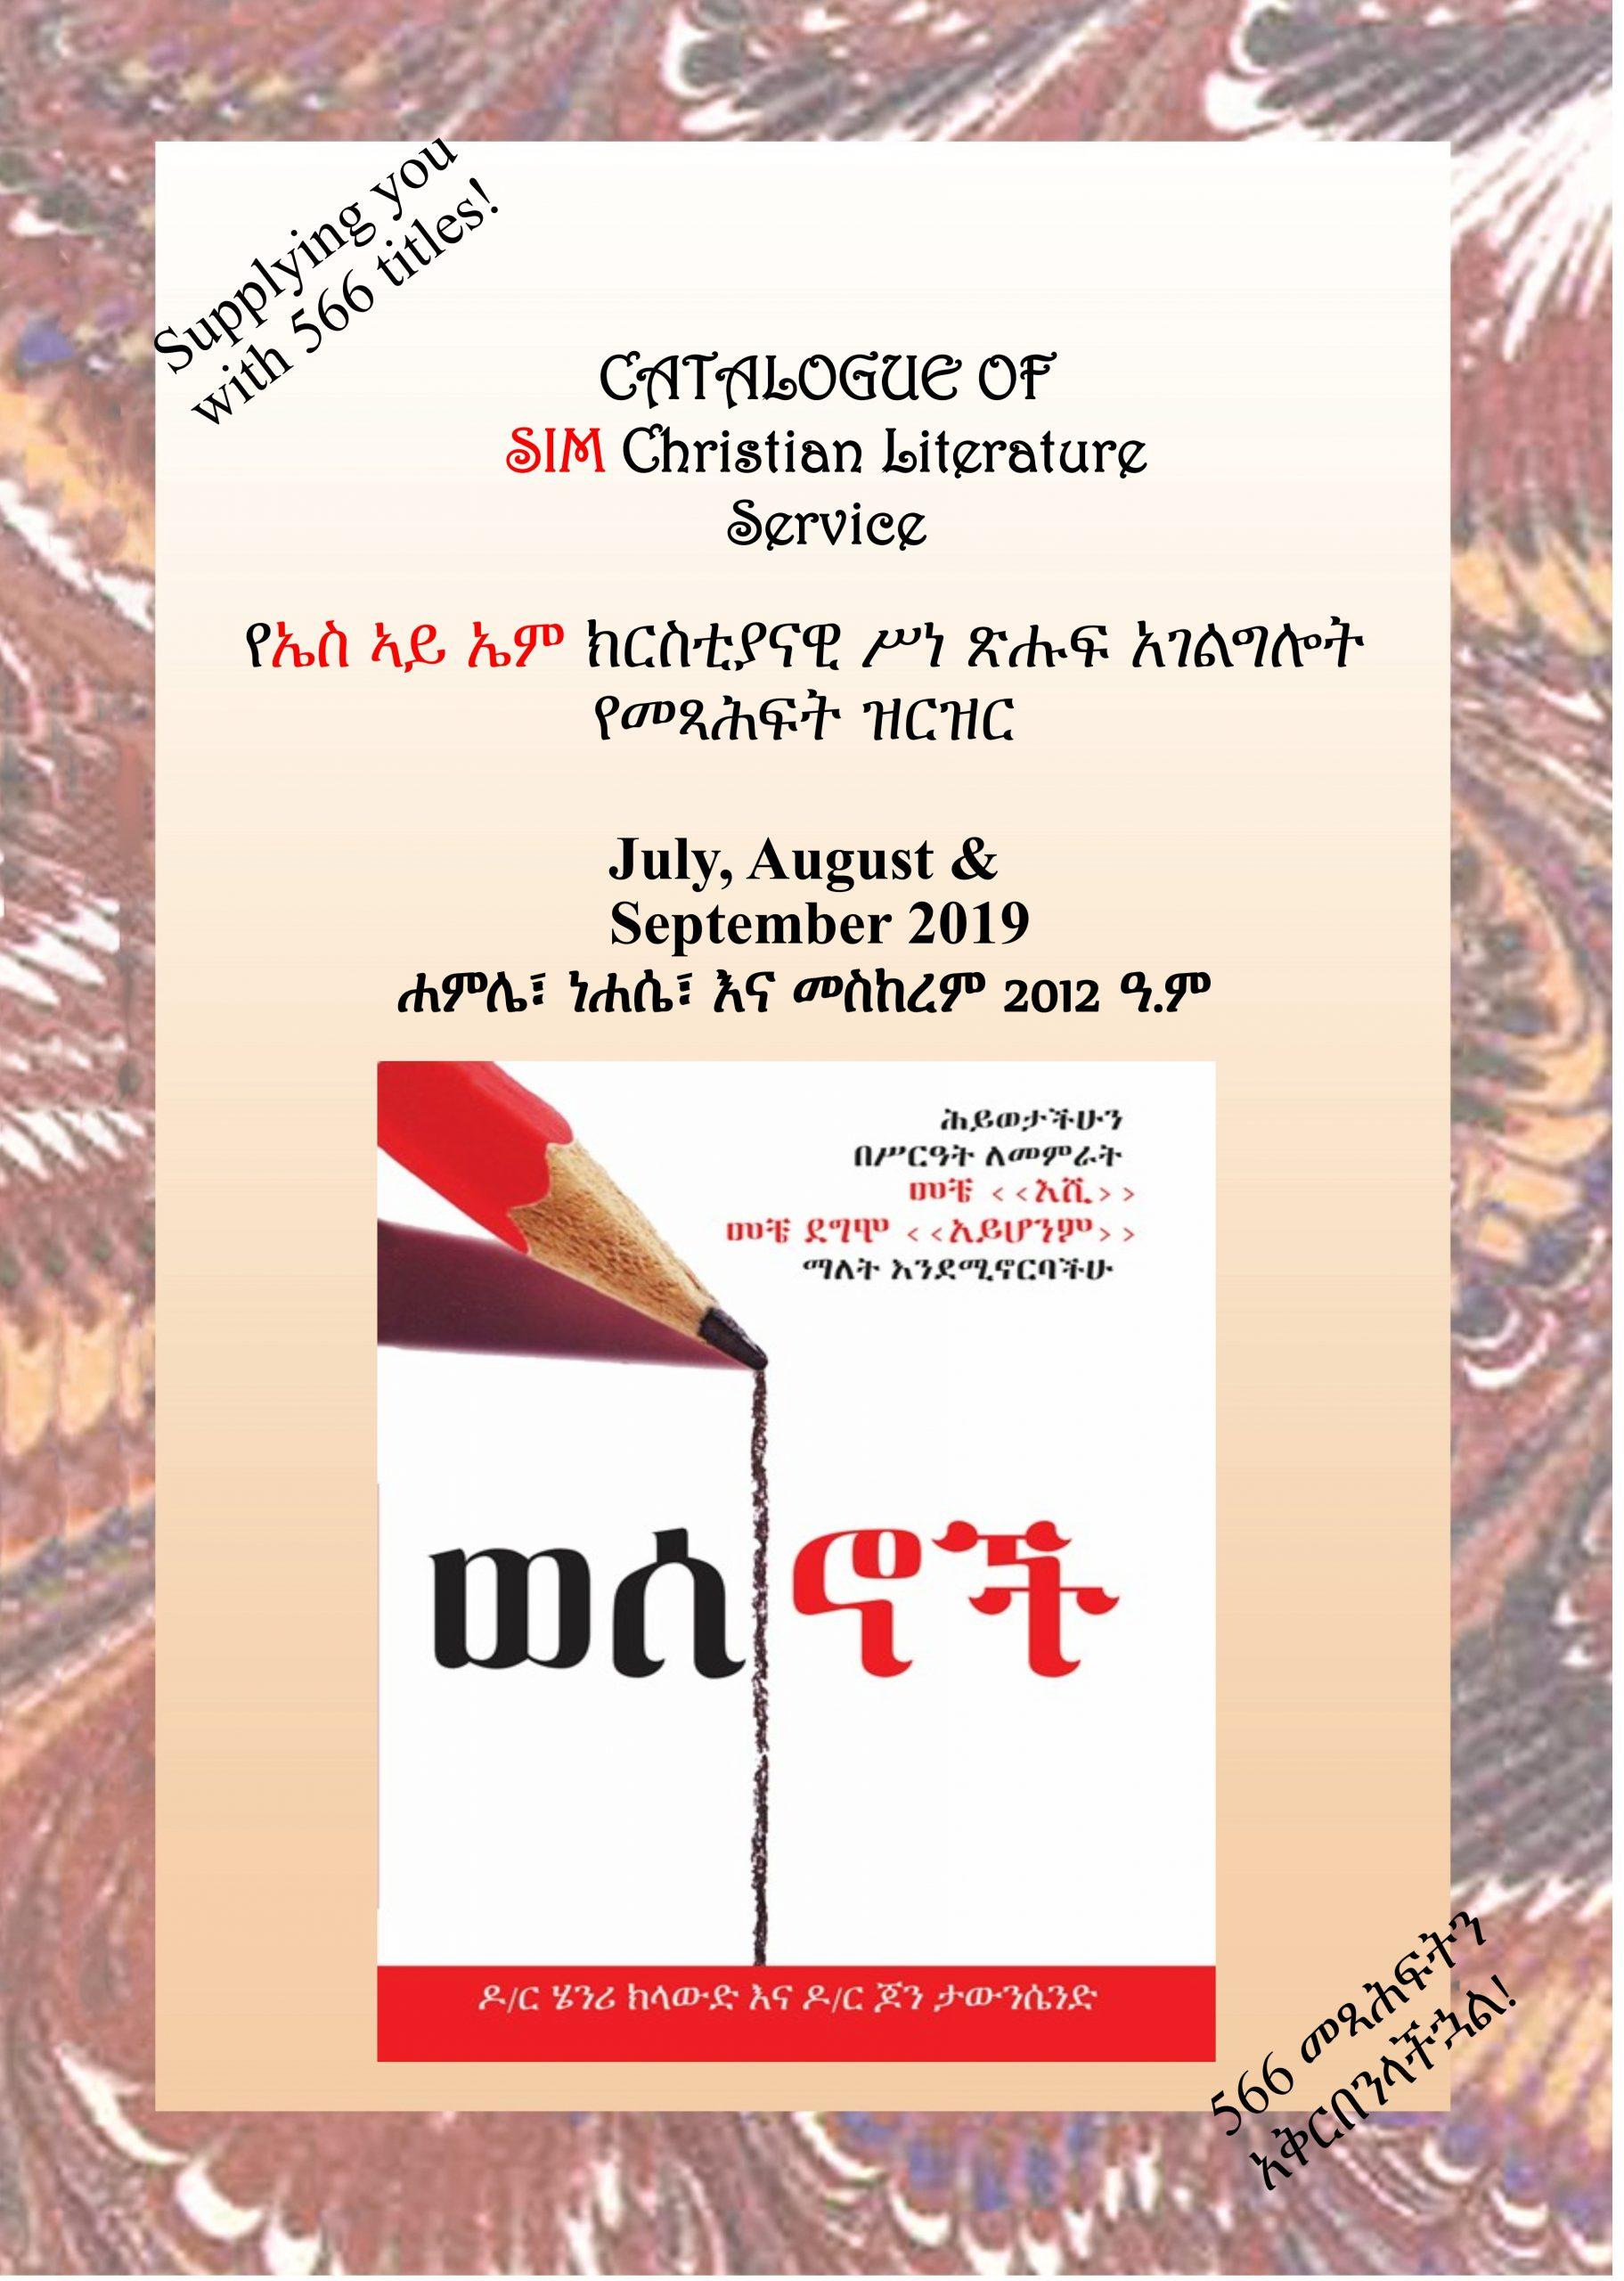 Catalog of SIM Christian Literature Service – የኤስ ኣይ ኤም ክርስቲያናዊ ሥነ ጽሑፍ አገልግሎት የመጻሕፍት ዝርዝር